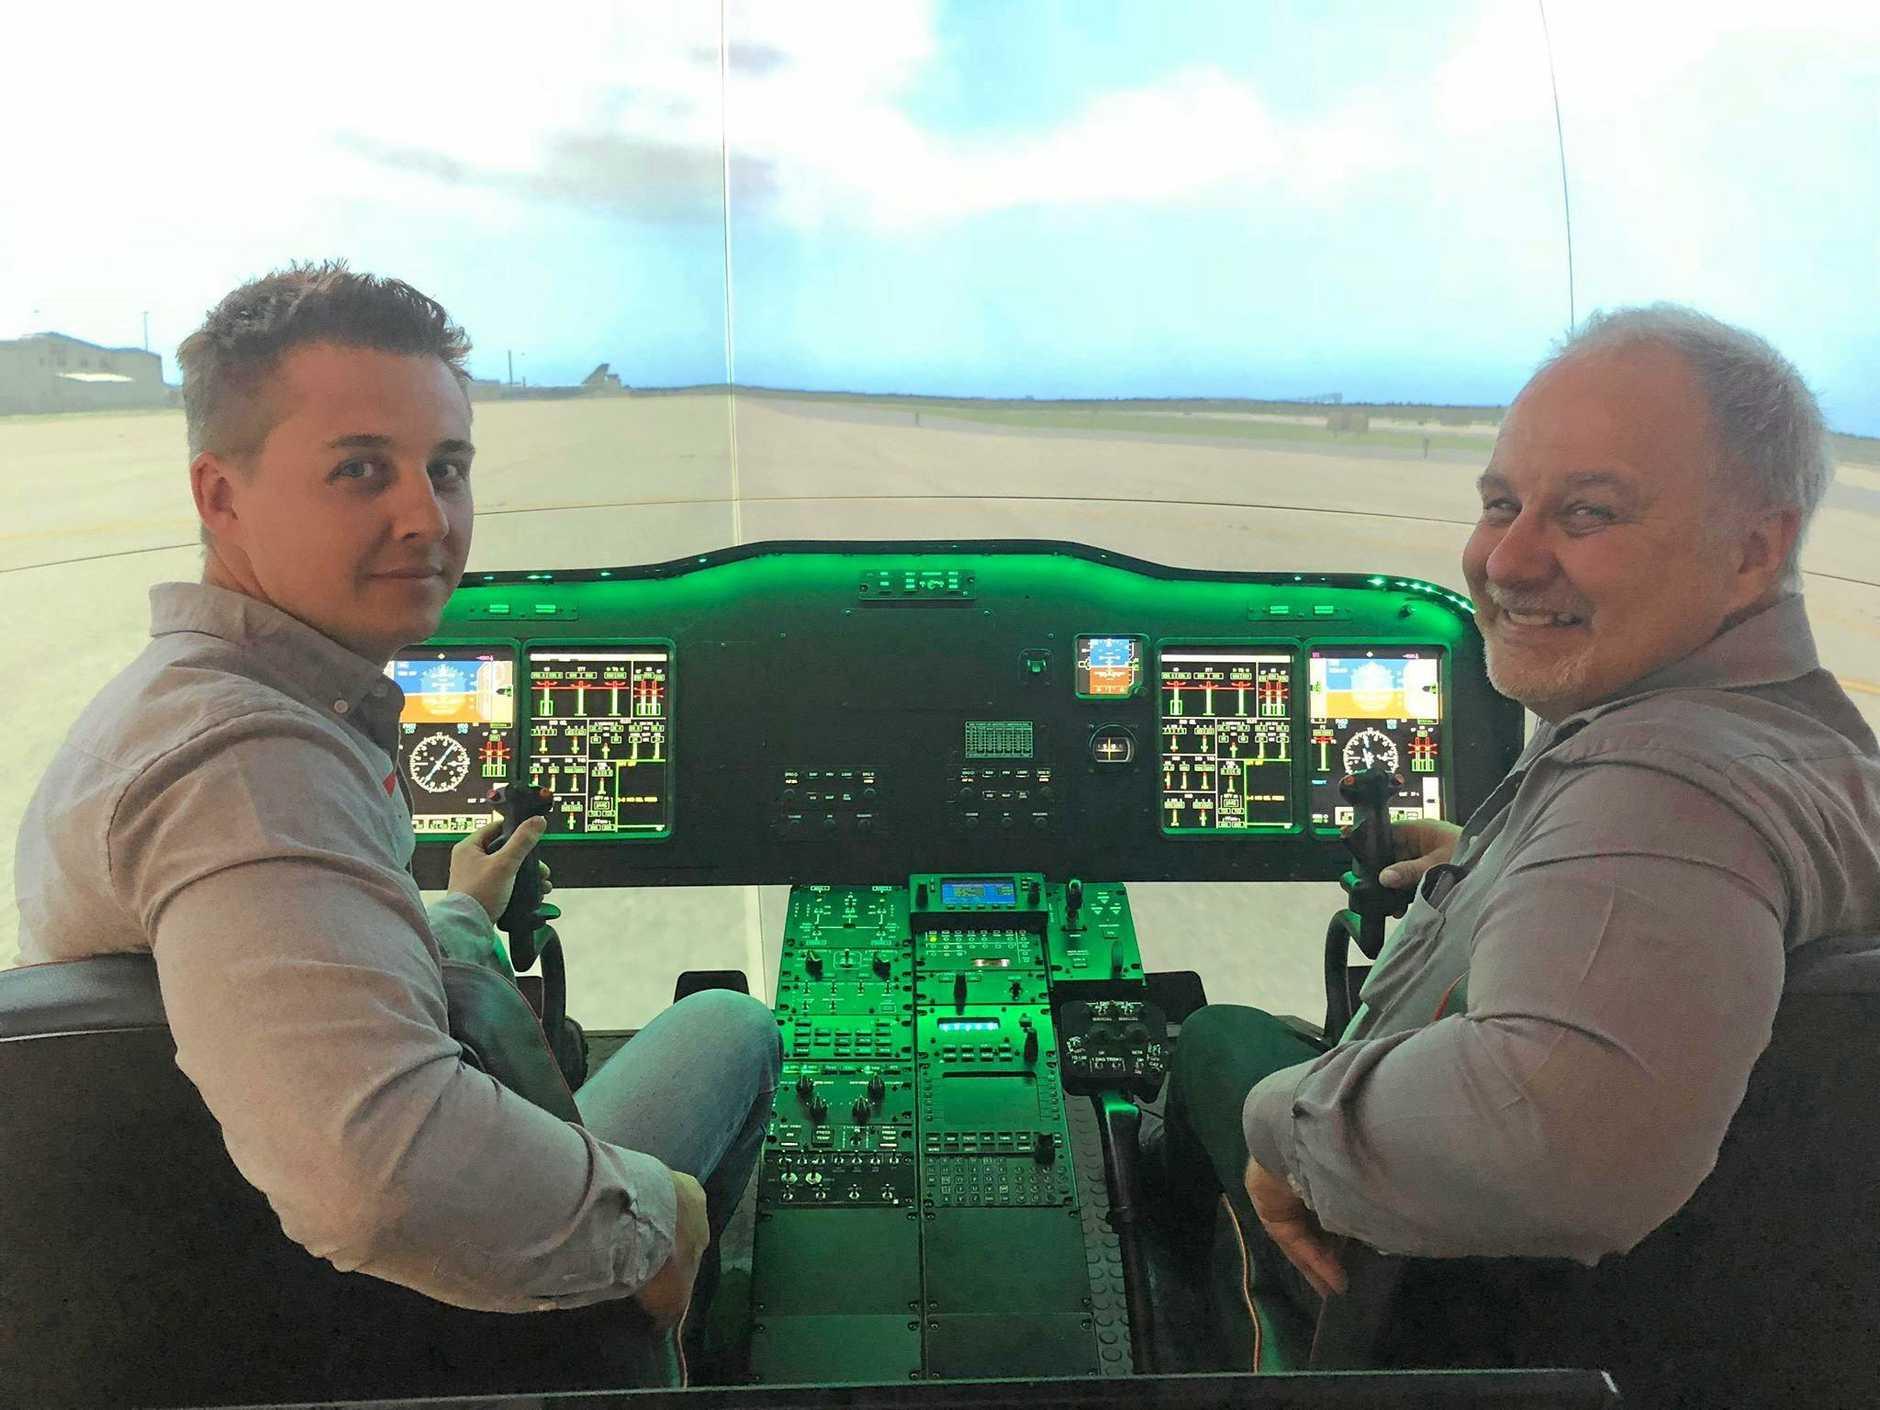 Chris and Charles du Plessis of Geosim Technologies inside its AW139 simulator.